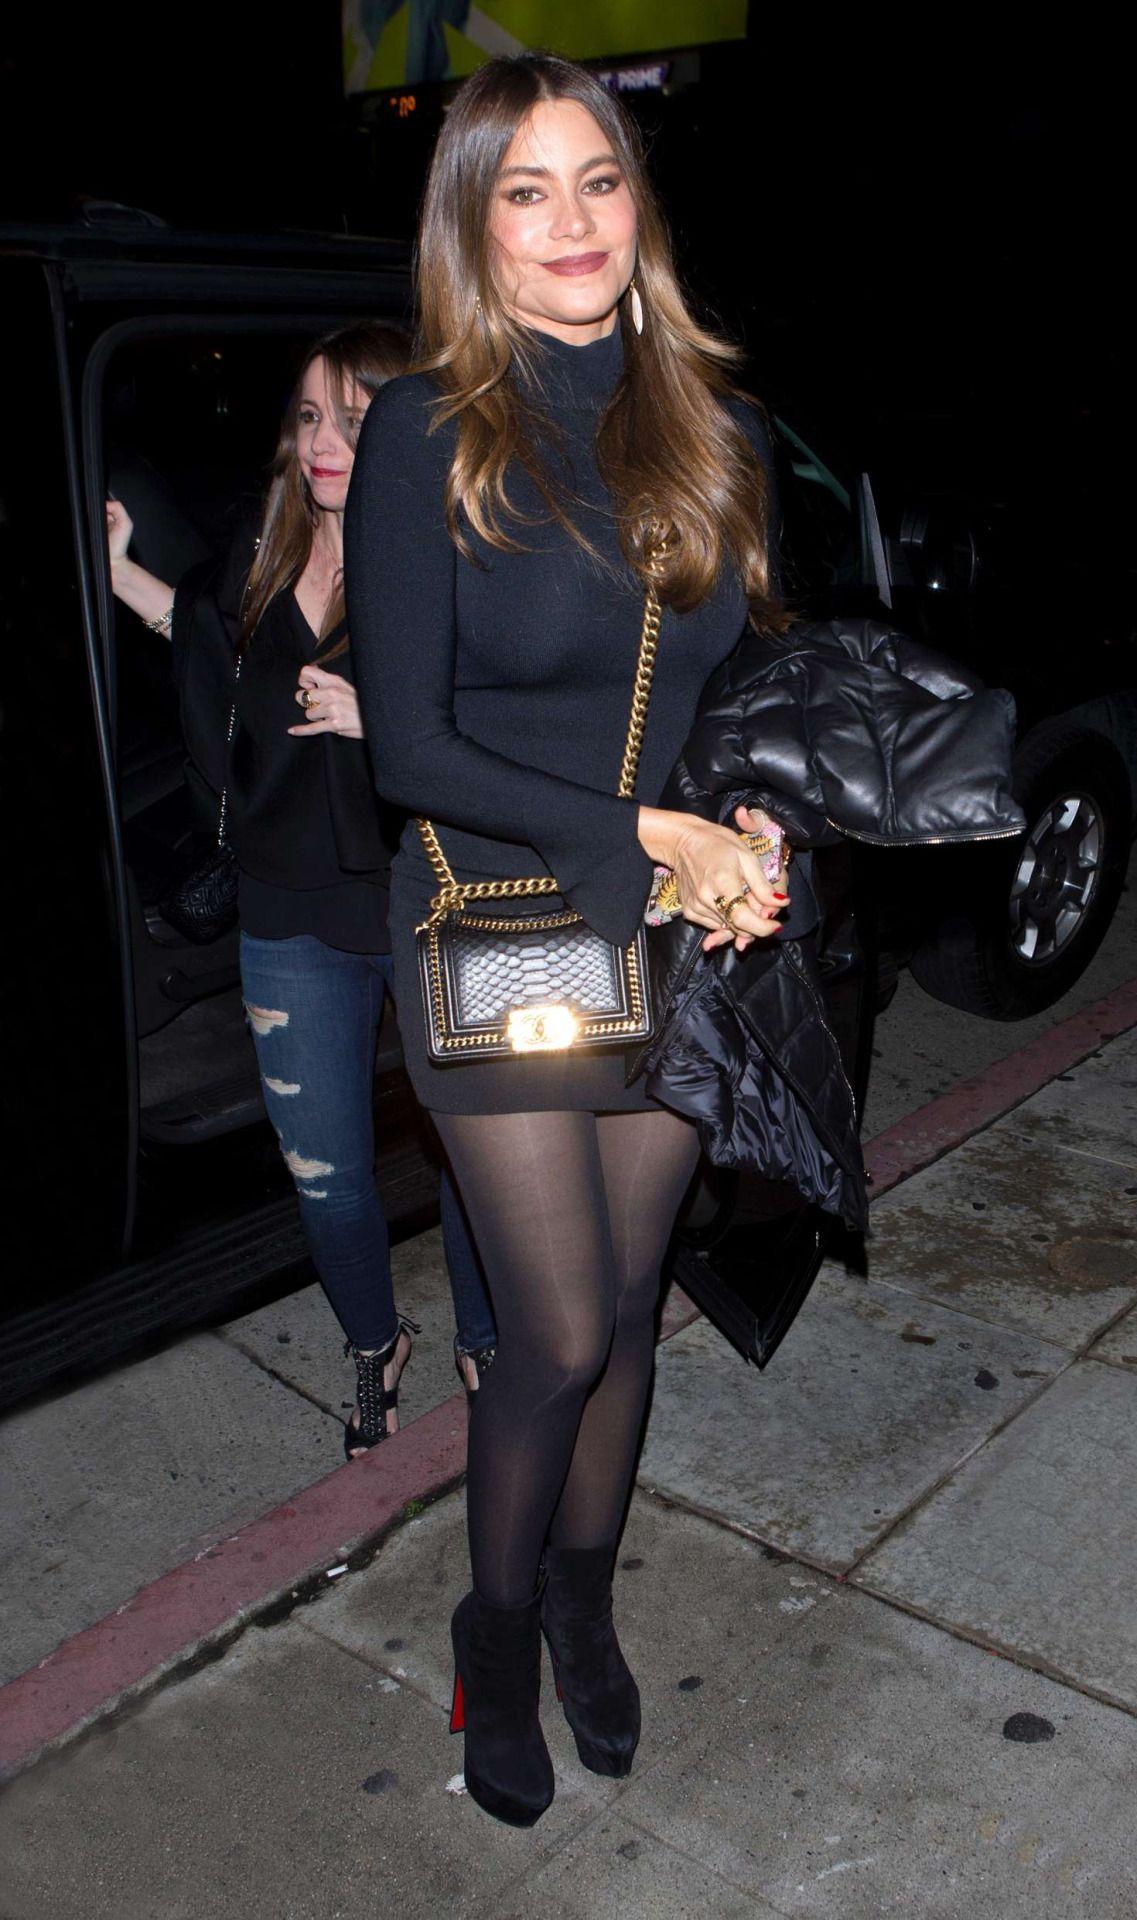 hotminiskirts: natalia phillips in a sexy short black mini skirt and